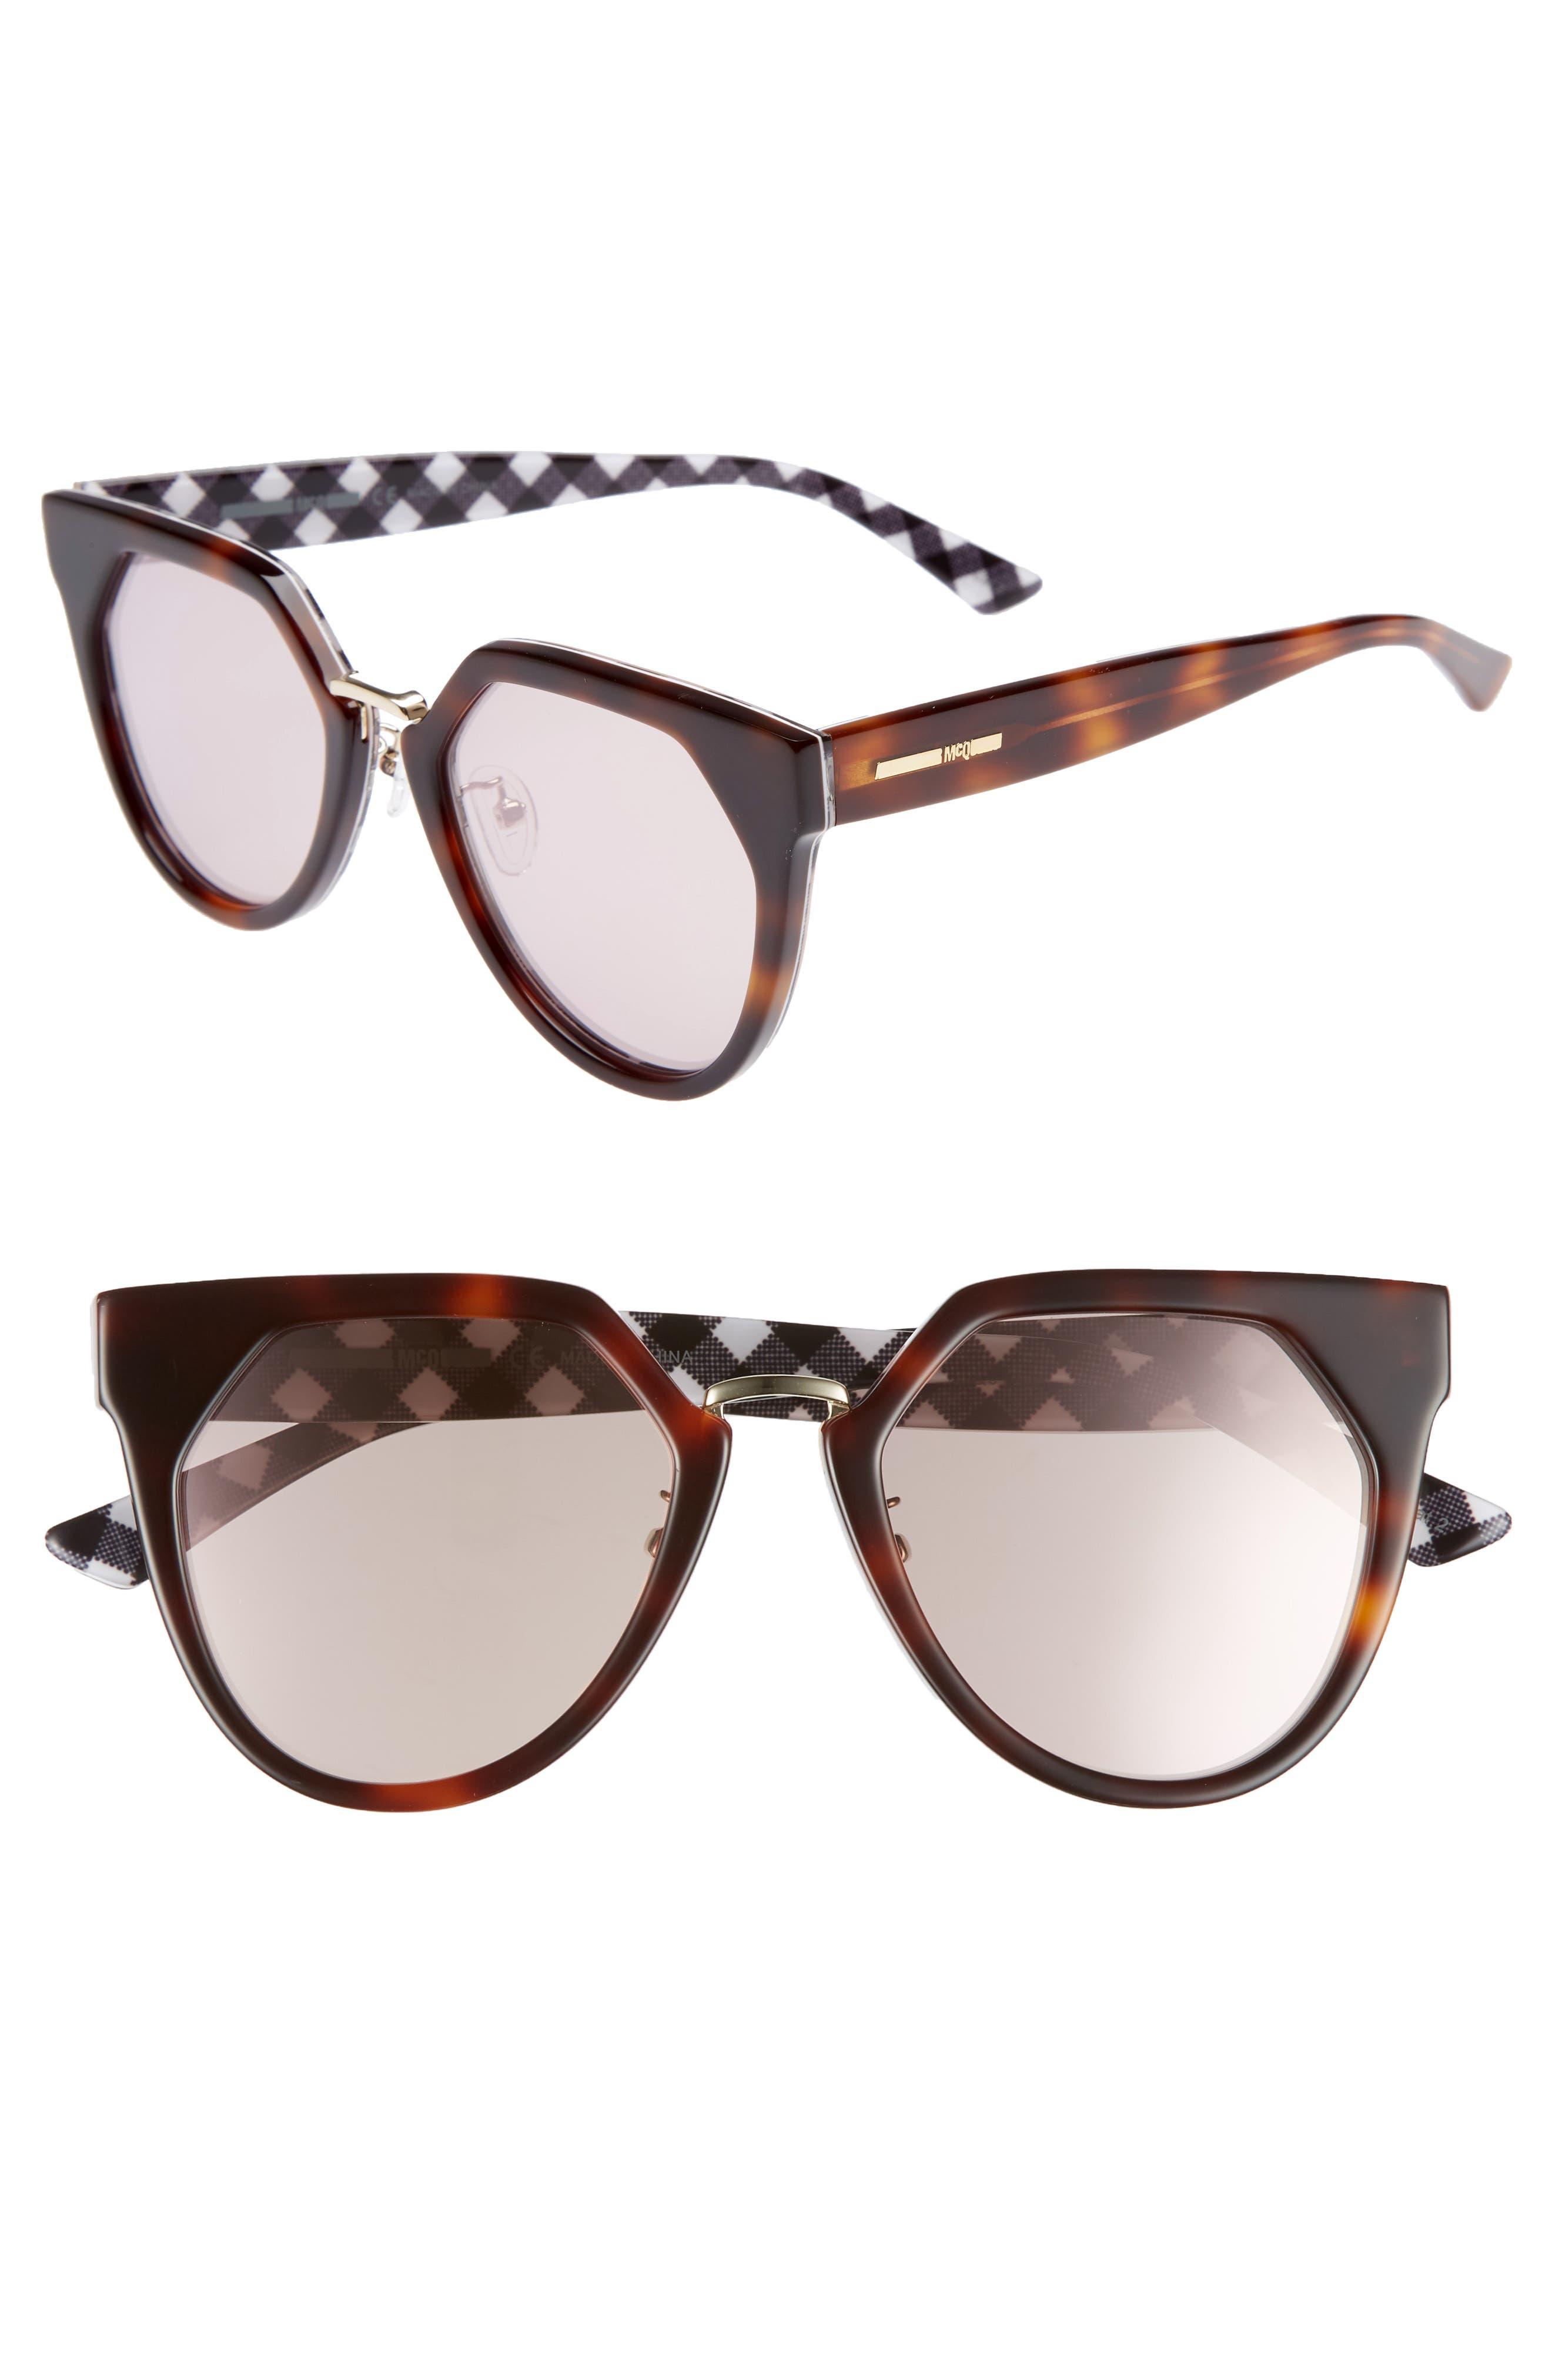 53mm Cat Eye Sunglasses,                         Main,                         color, Havana